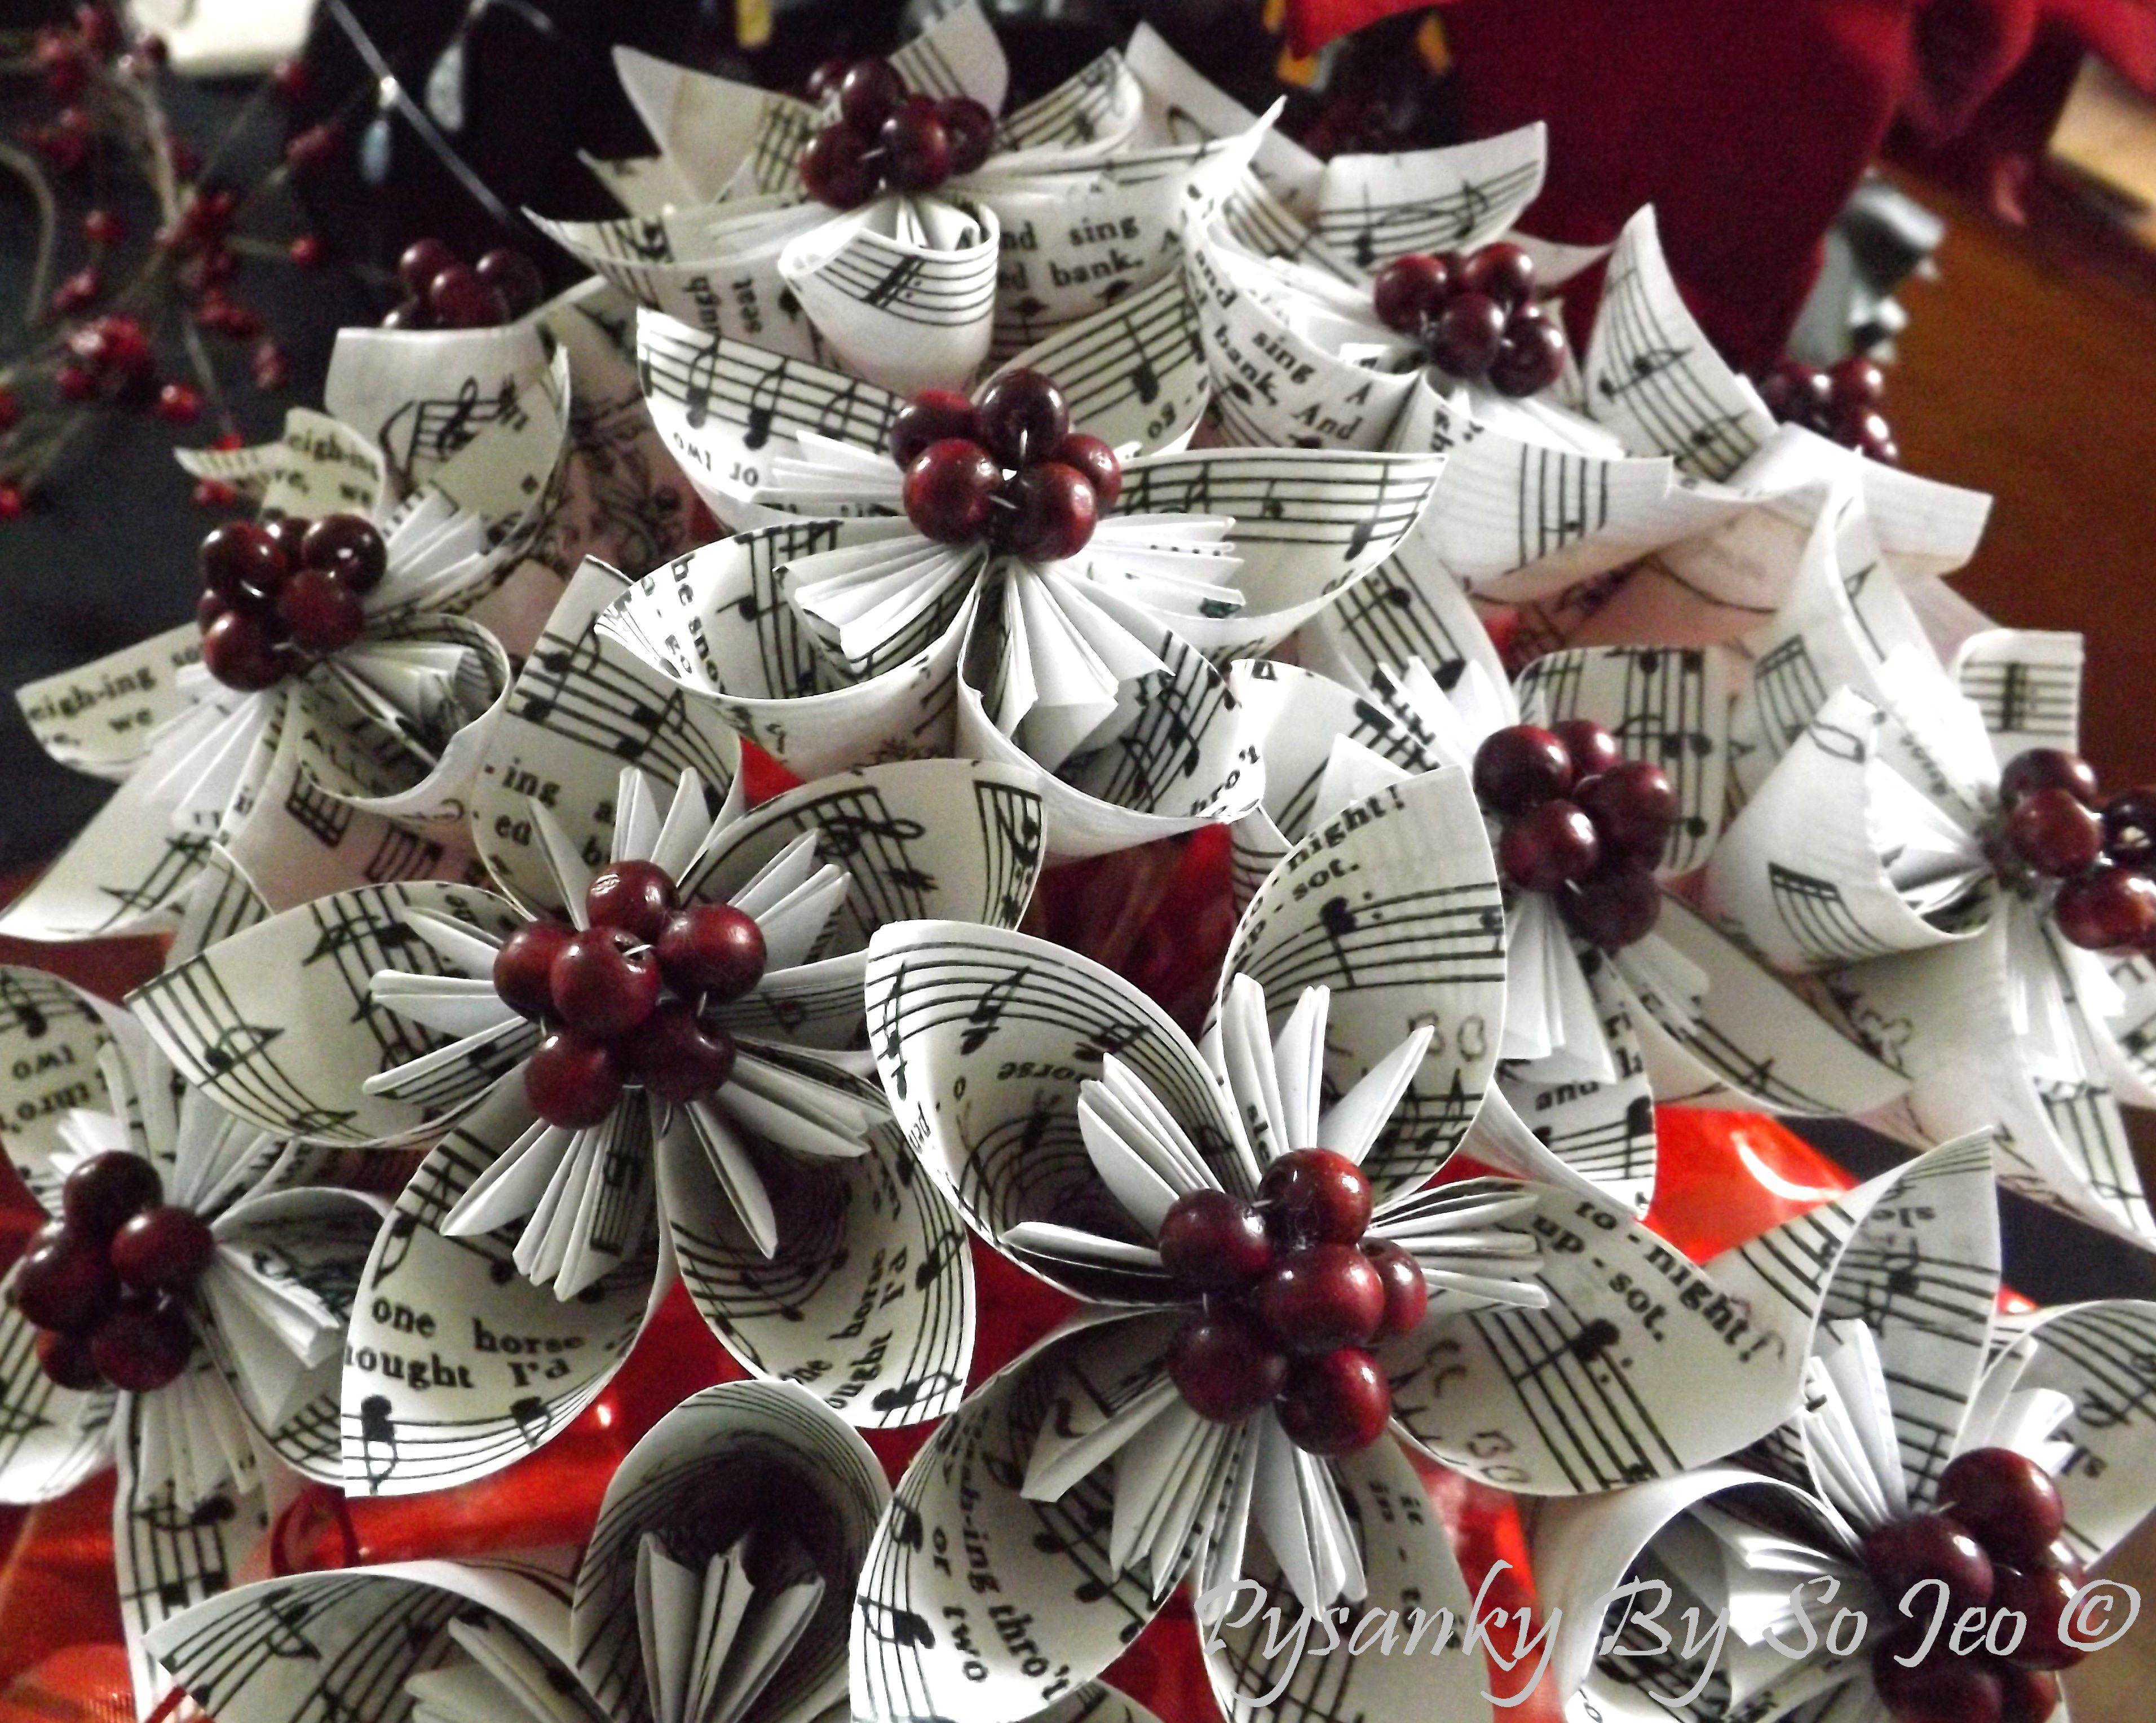 Bouquet of Jingle Bell sheet music Kusudama Flowers